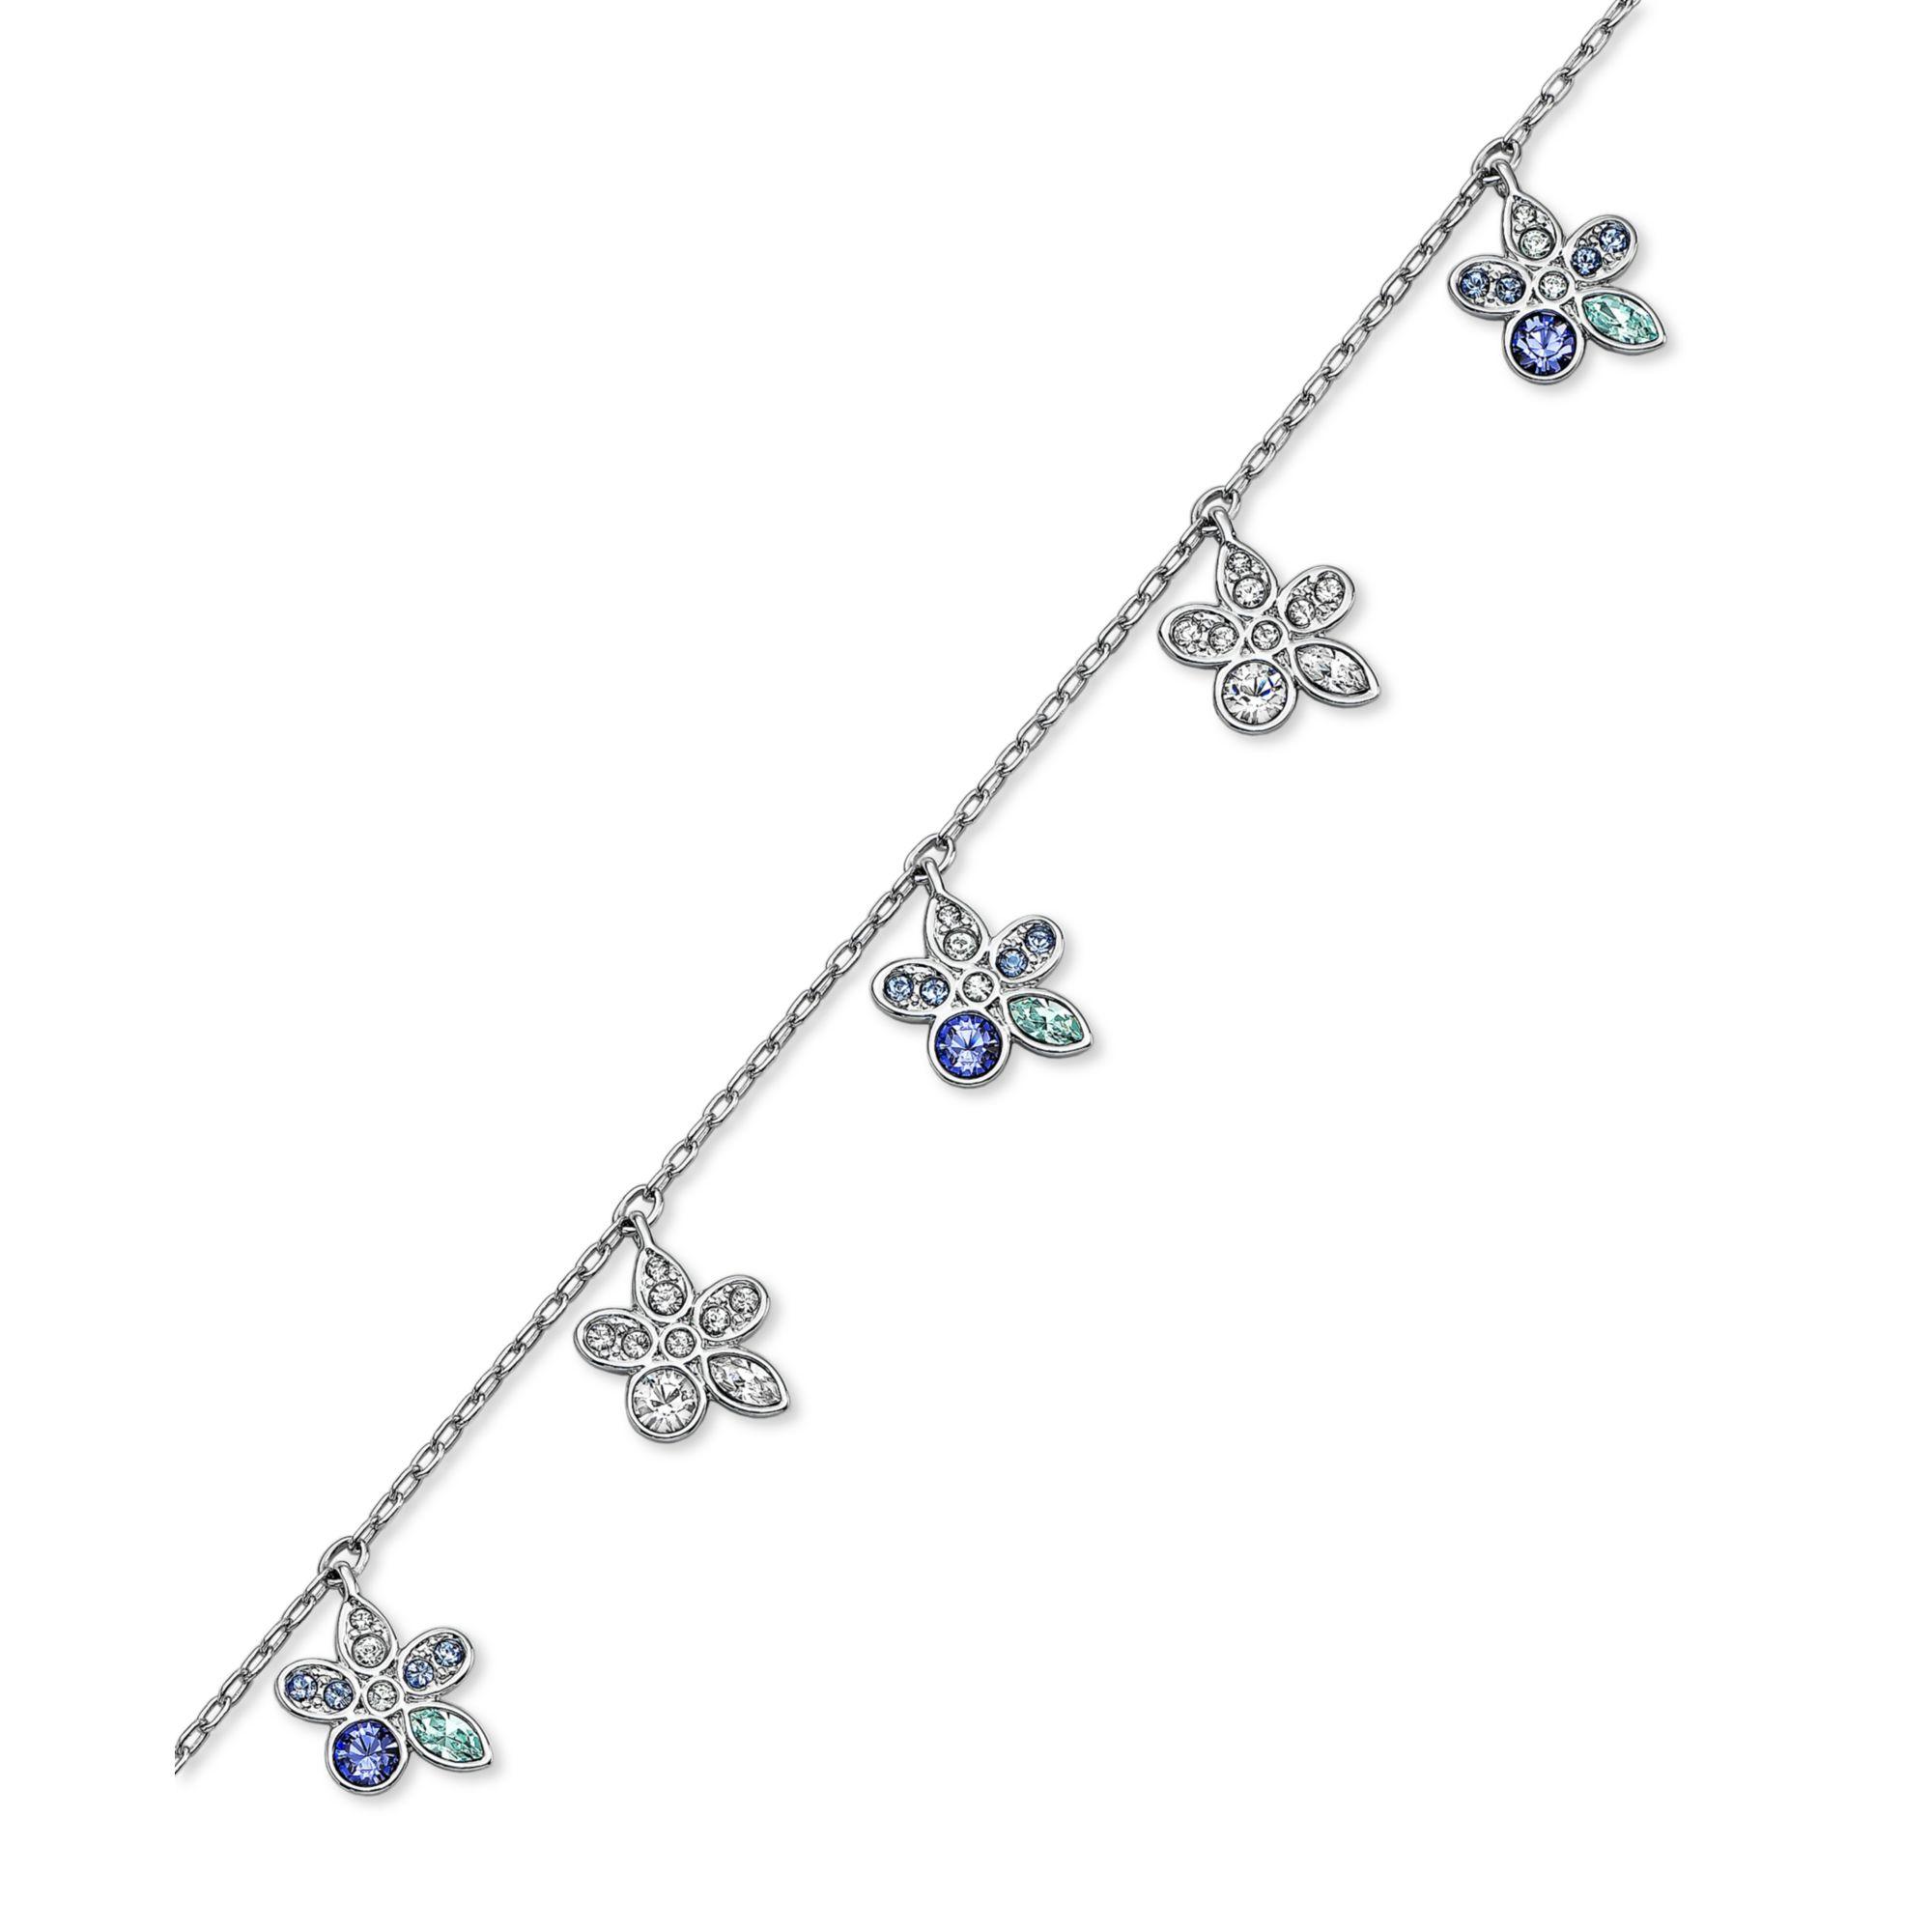 Lyst - Swarovski Rhodiumplated Crystal Pave Flower Charm Bracelet in ... be297be2c2ab